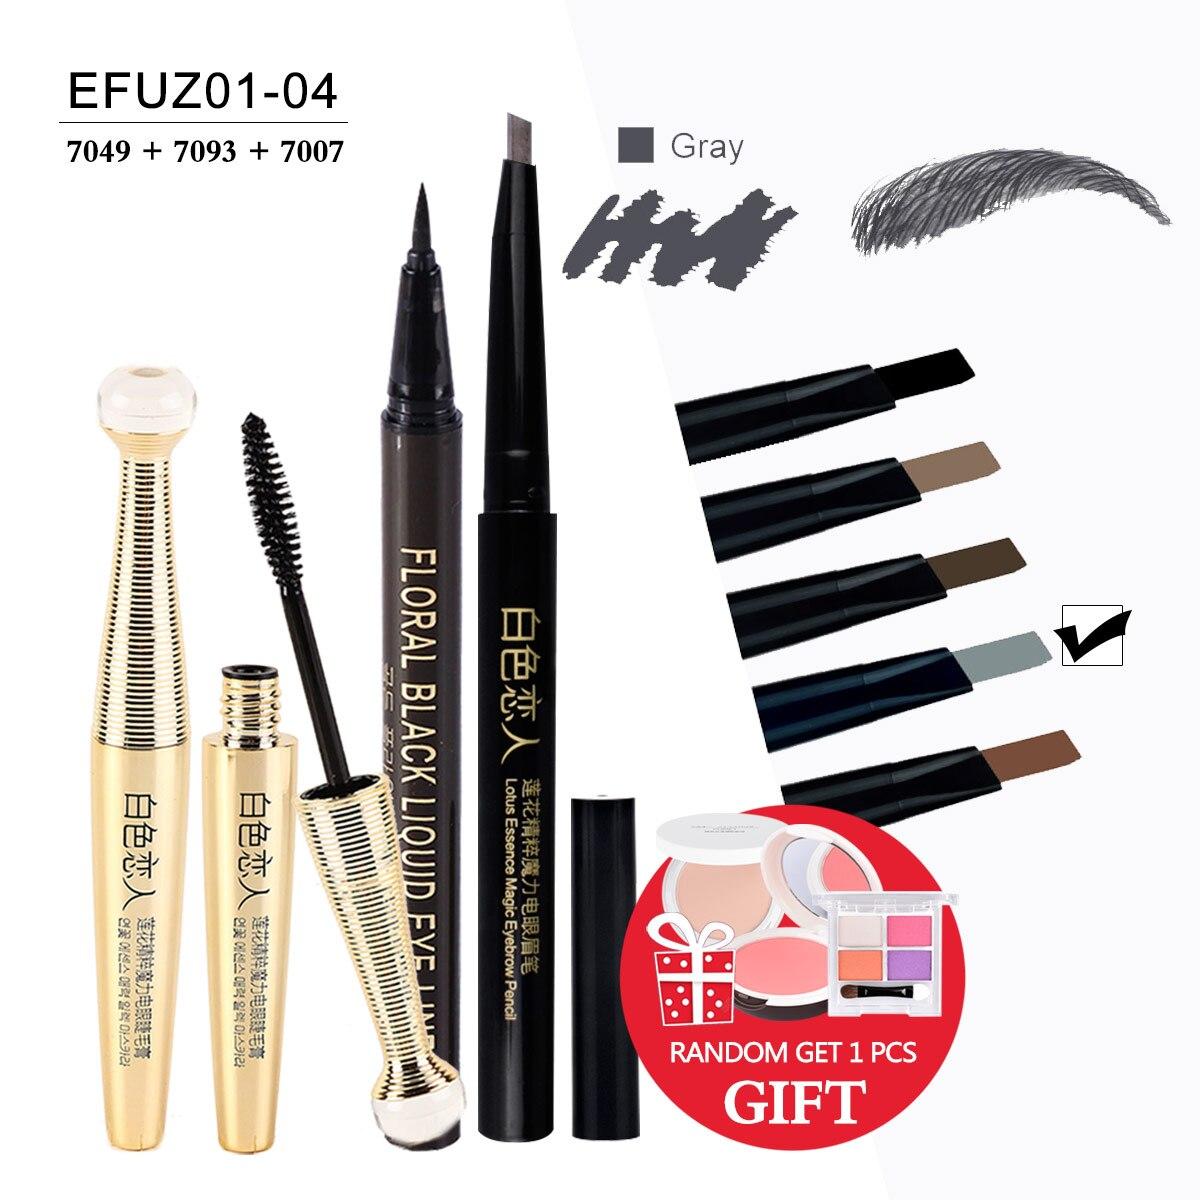 [ Buy 3 Get 1 Gift ] 1Set=4Pcs Waterproof Mascara And Eyeliner And Eyebrow pencil Eye Makeup Set Makeup Brand EFU #EFUZ01